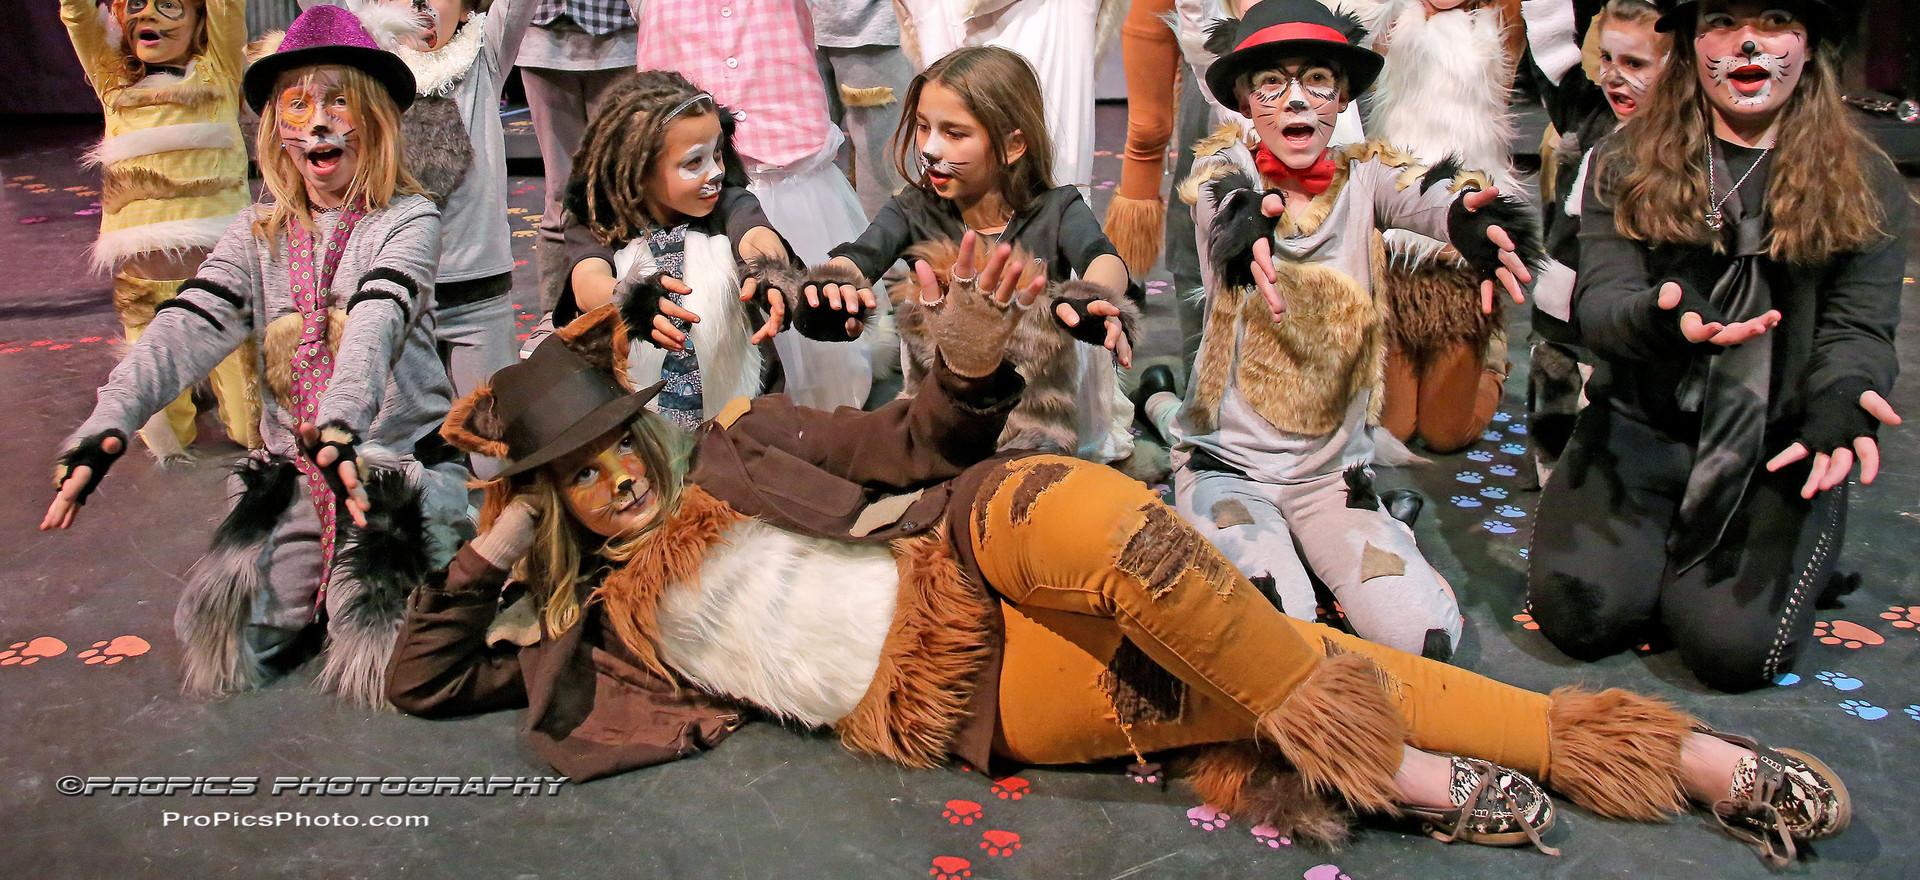 Arisocats Kids- Troupers